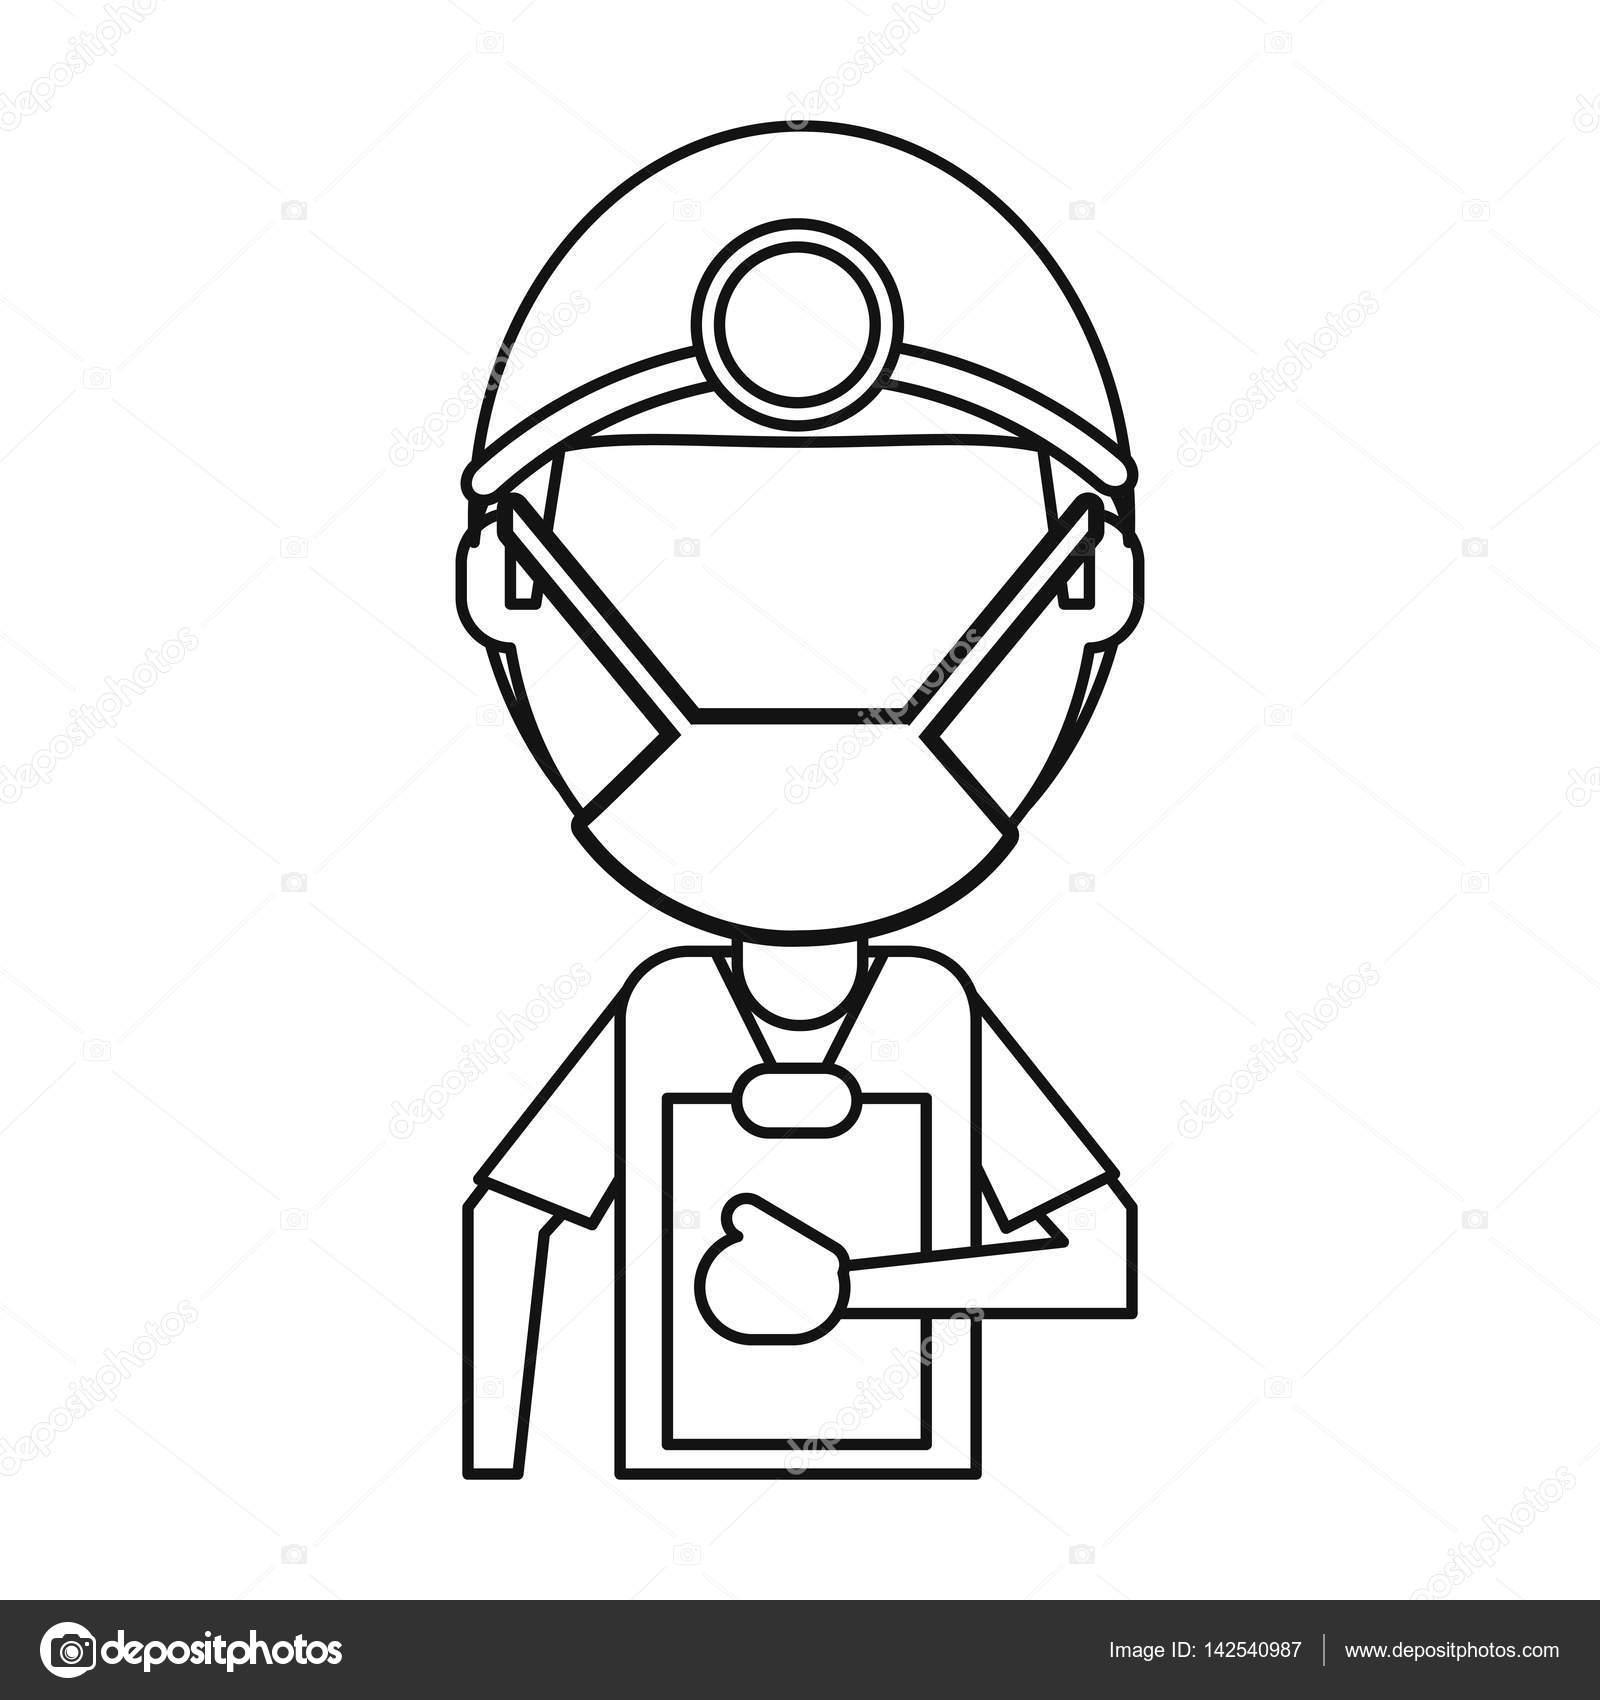 Clipboard Drawing At Getdrawings